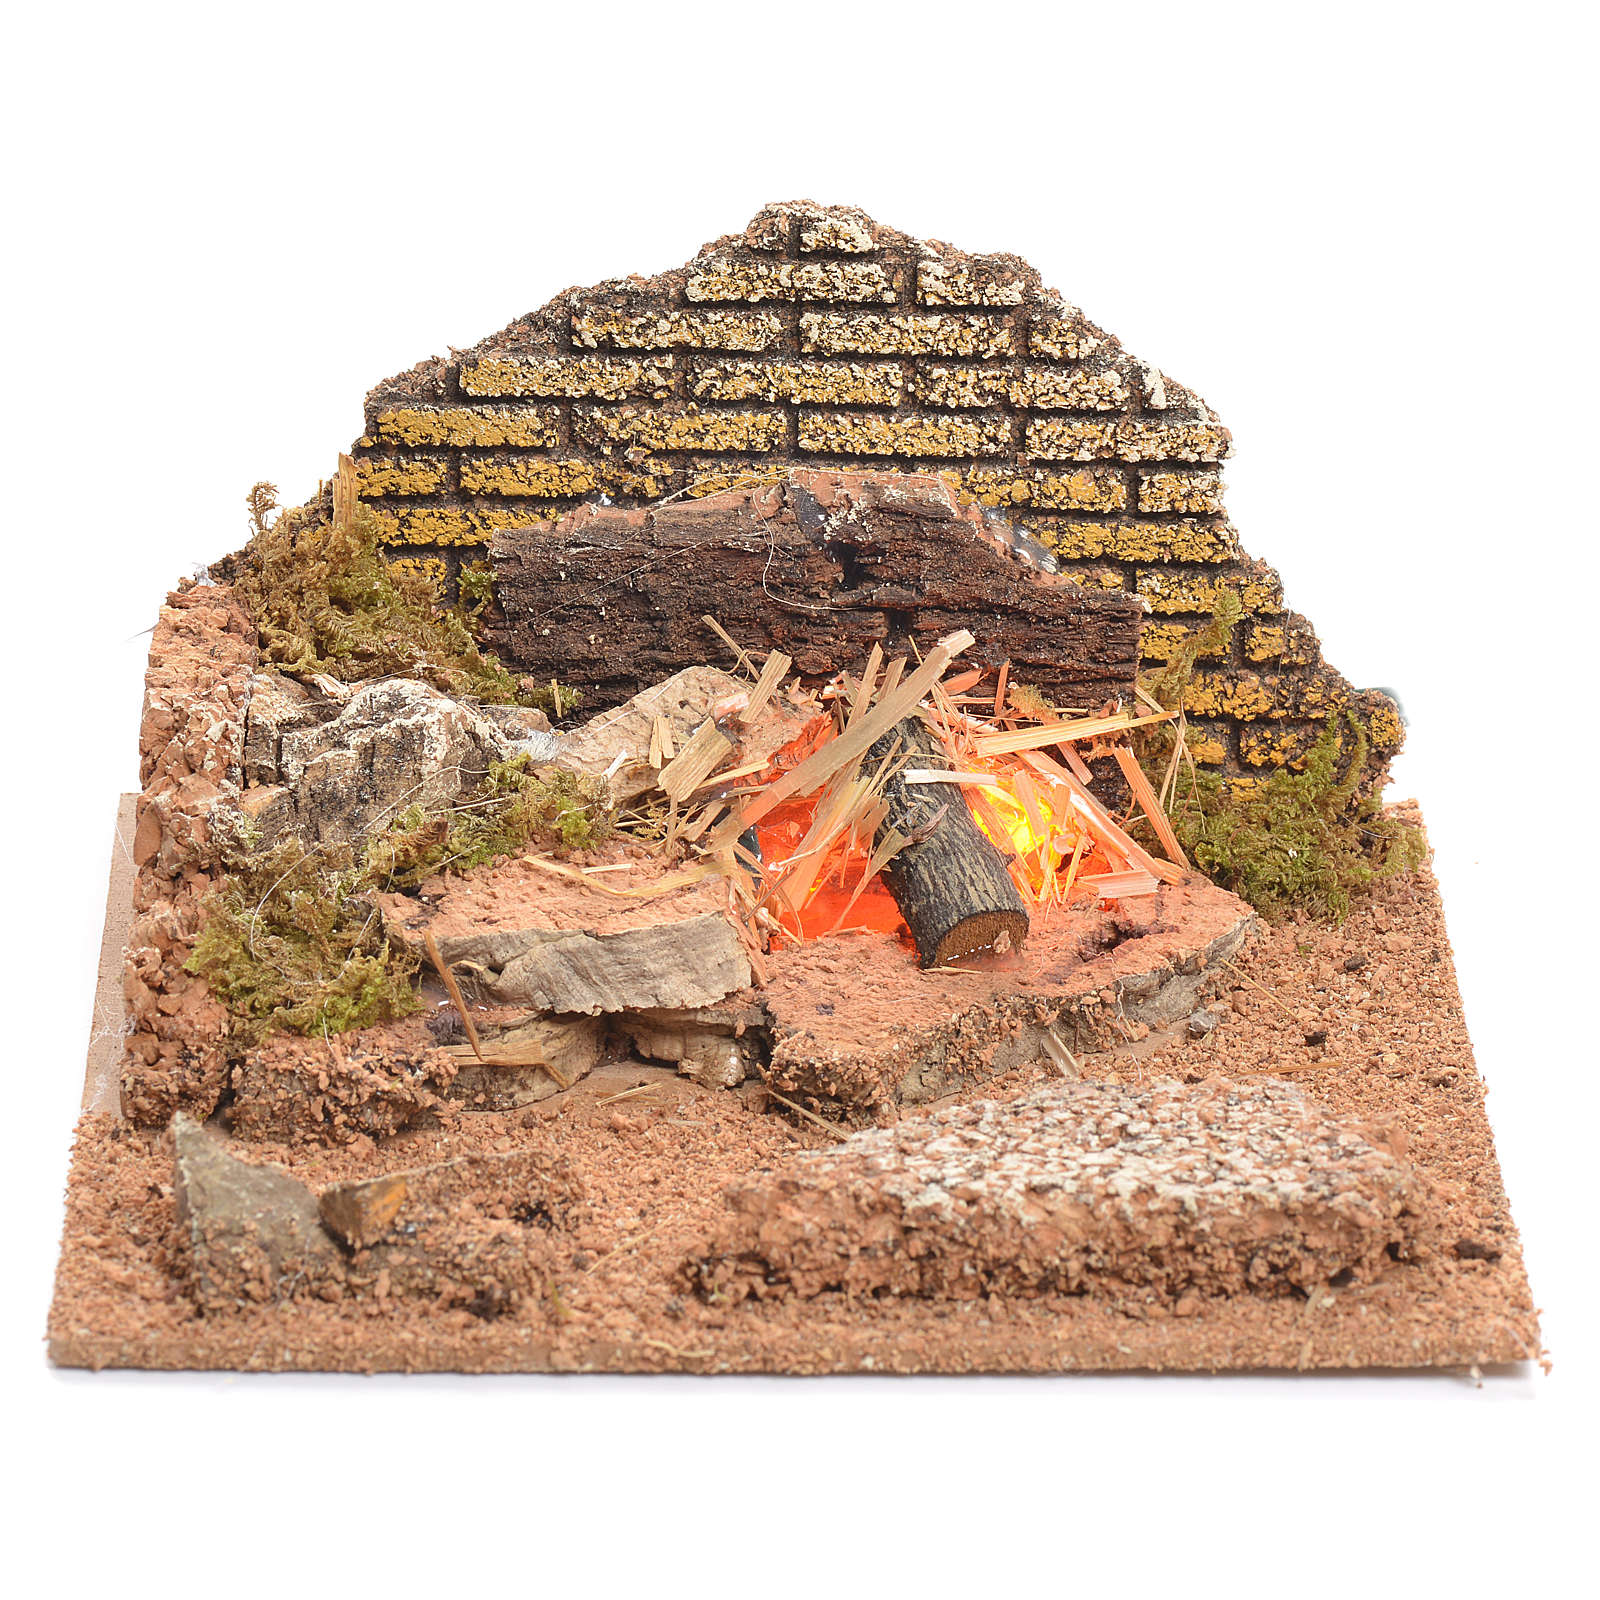 Illuminated nativity scene with fire 8x15x15cm 4